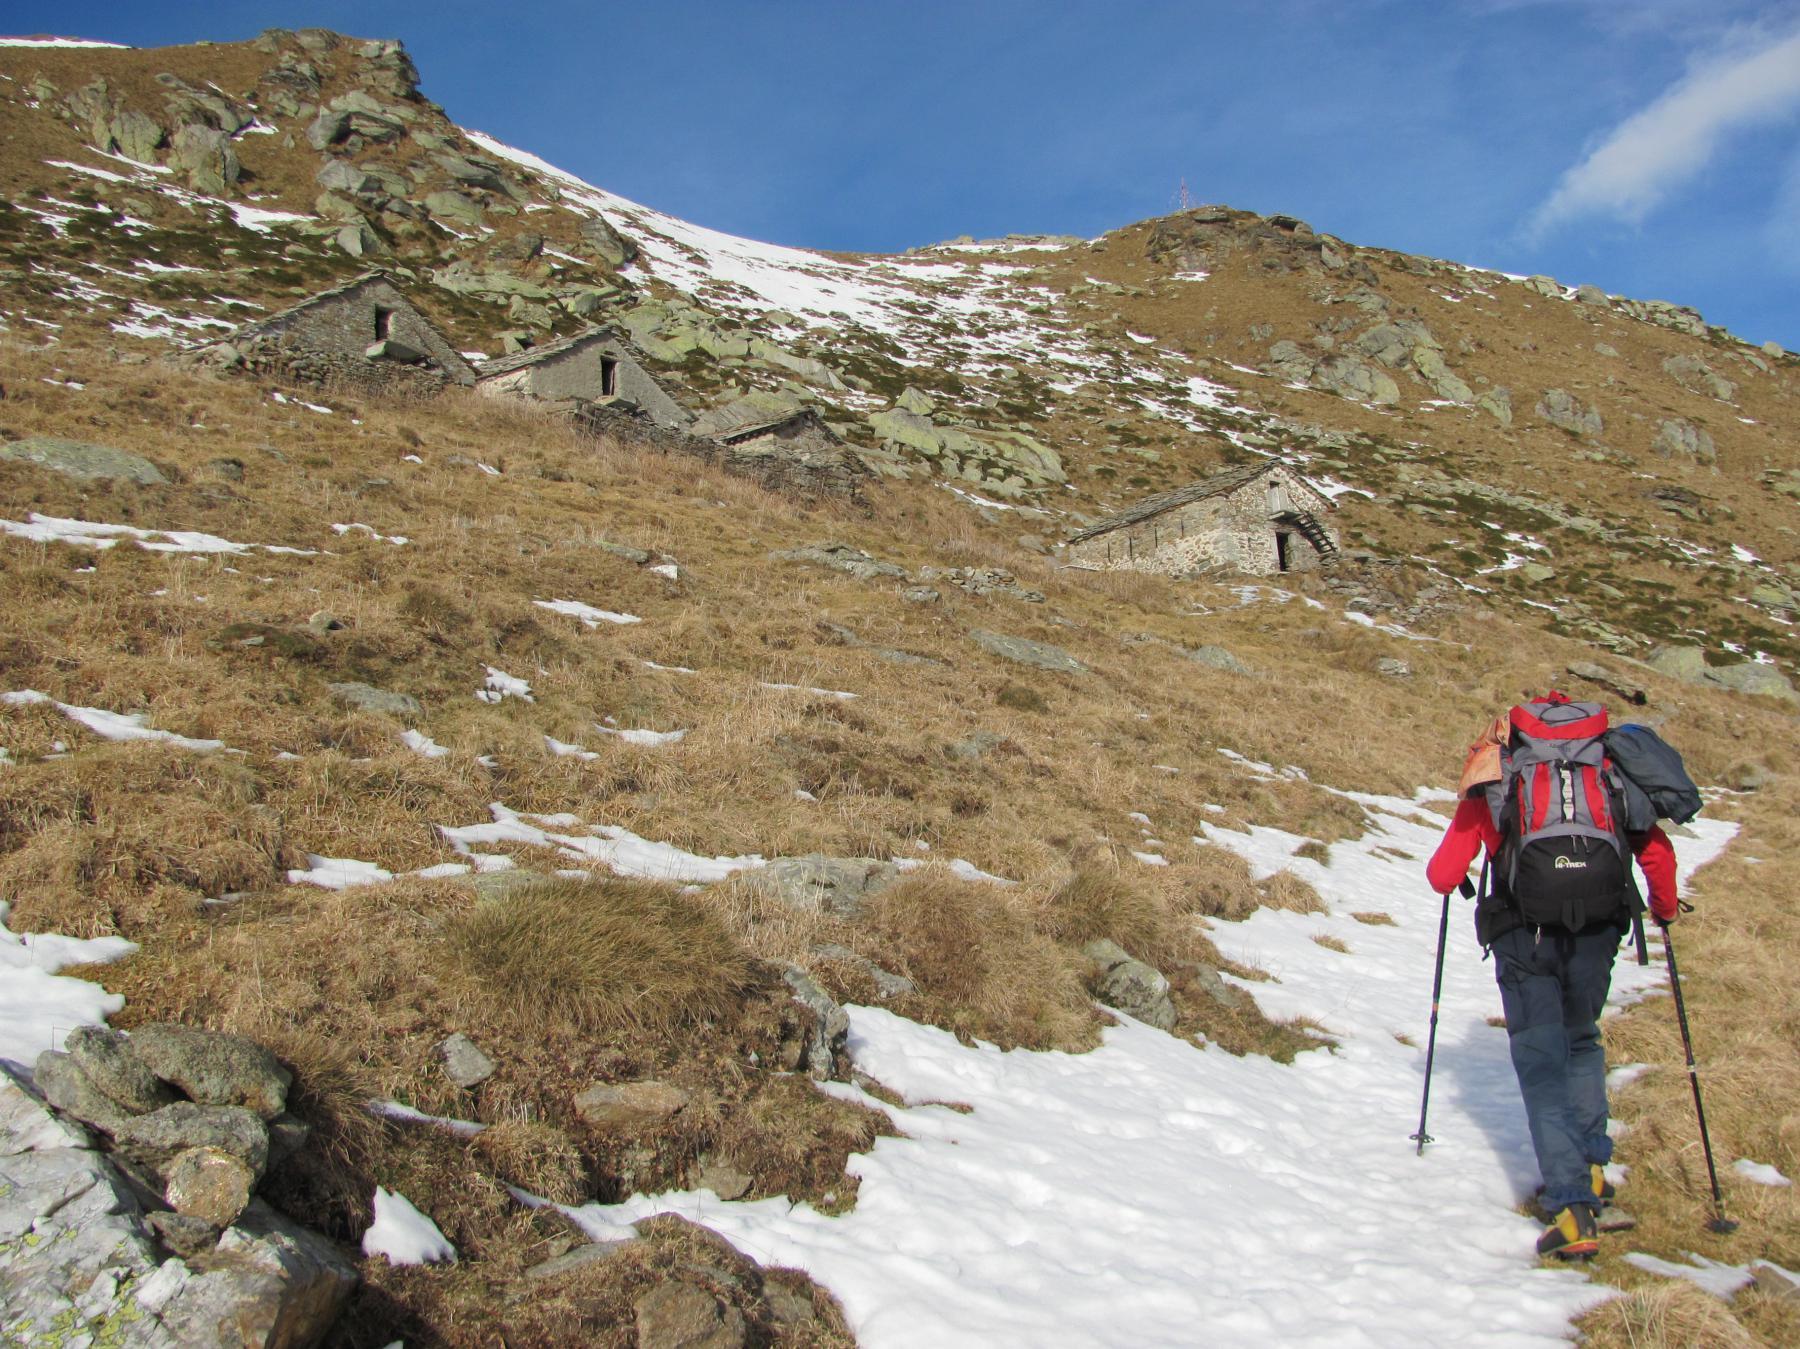 Arrivati all'Alpe Buscajoun m. 1965